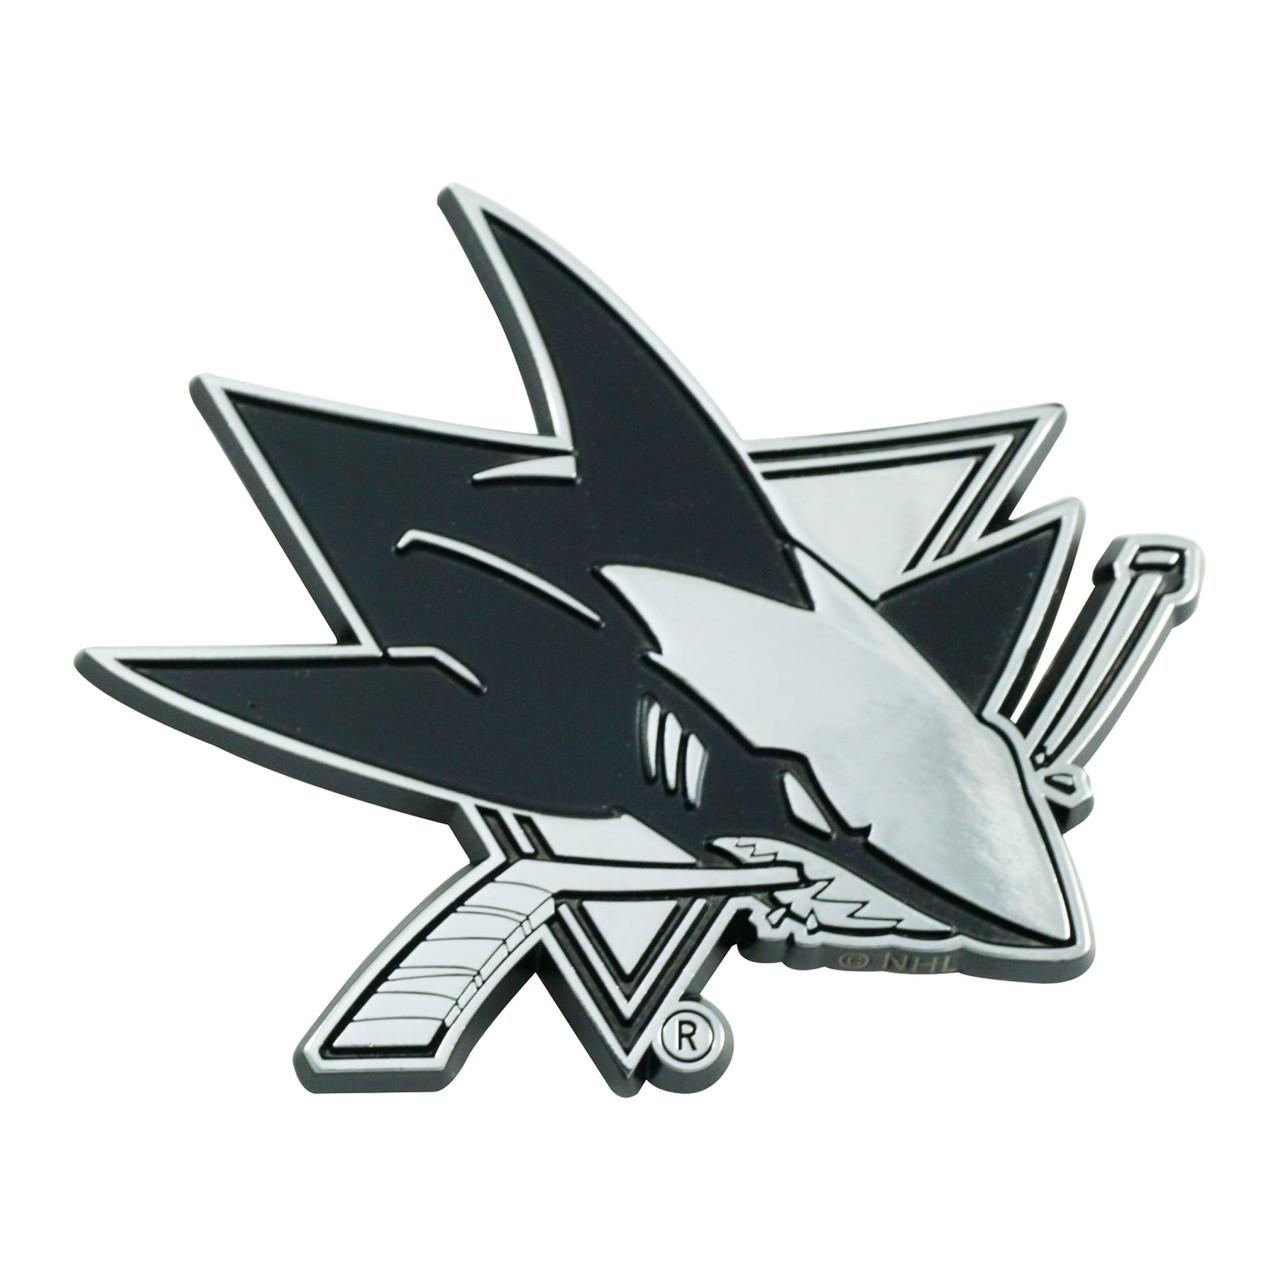 San Jose Sharks Auto Emblem Premium Metal Chrome Special Order